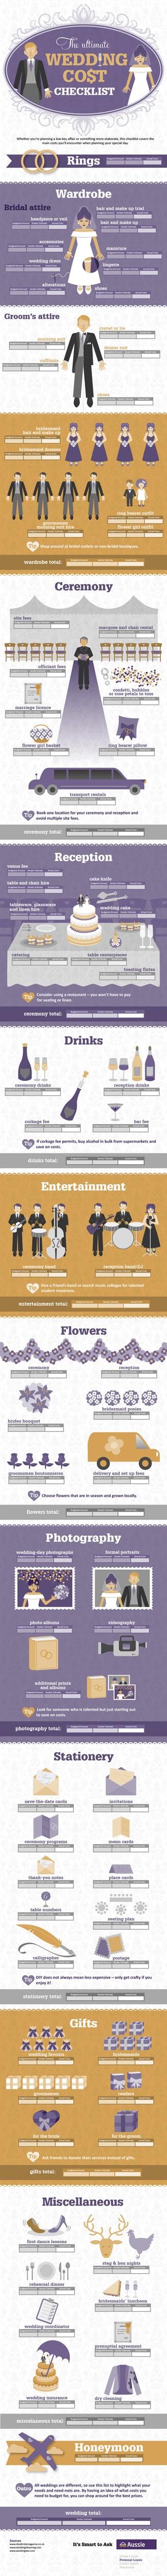 Wedding-Checklist-2